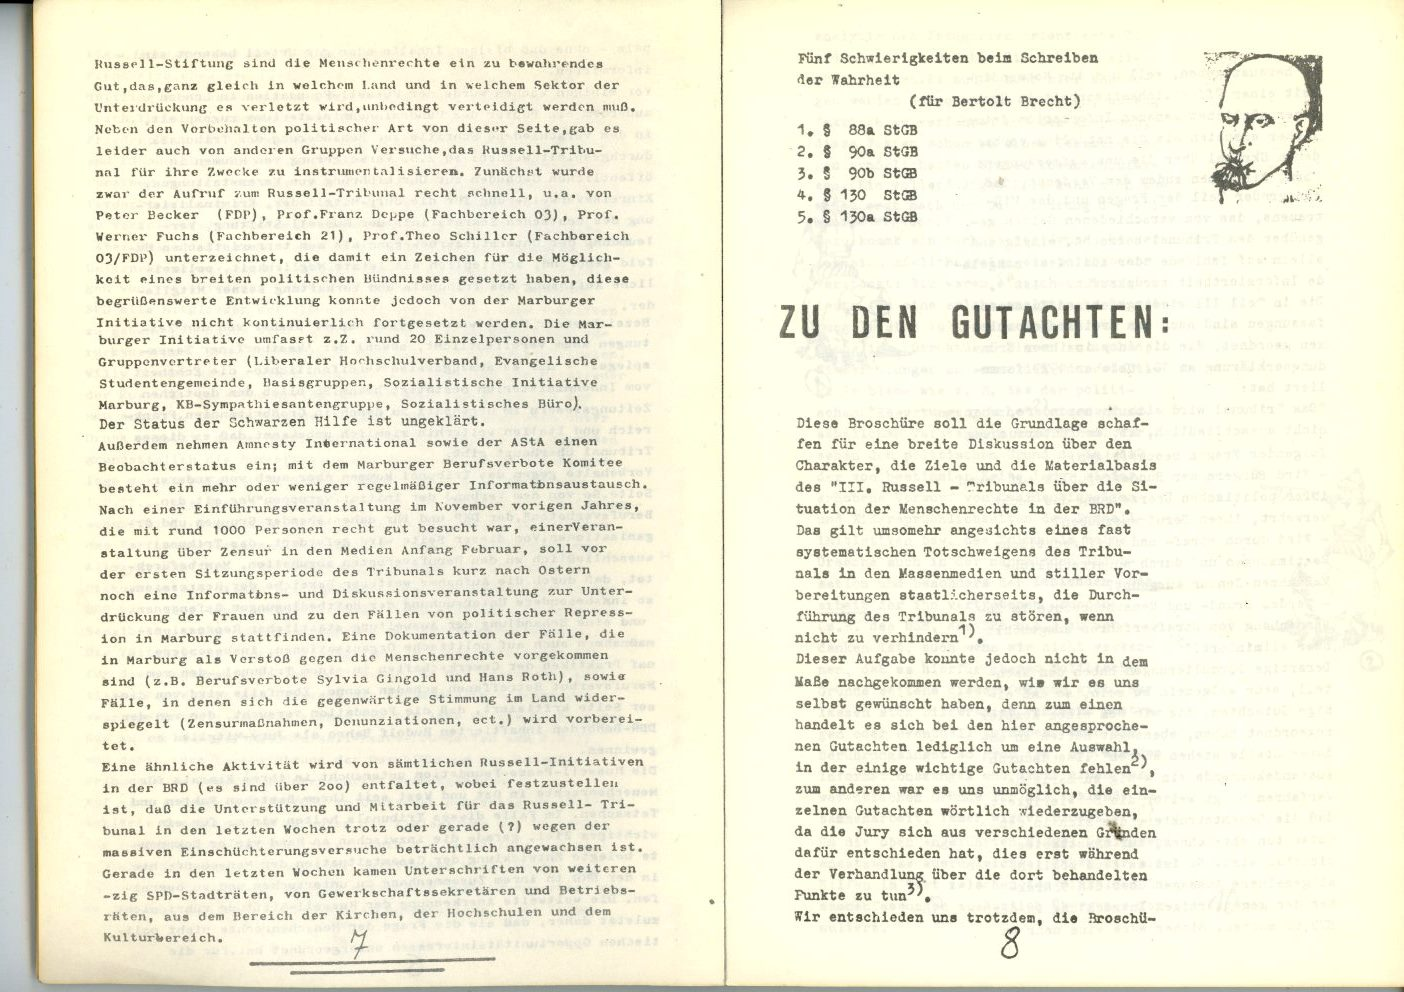 Marburg_Russell_Initiative_1978_05